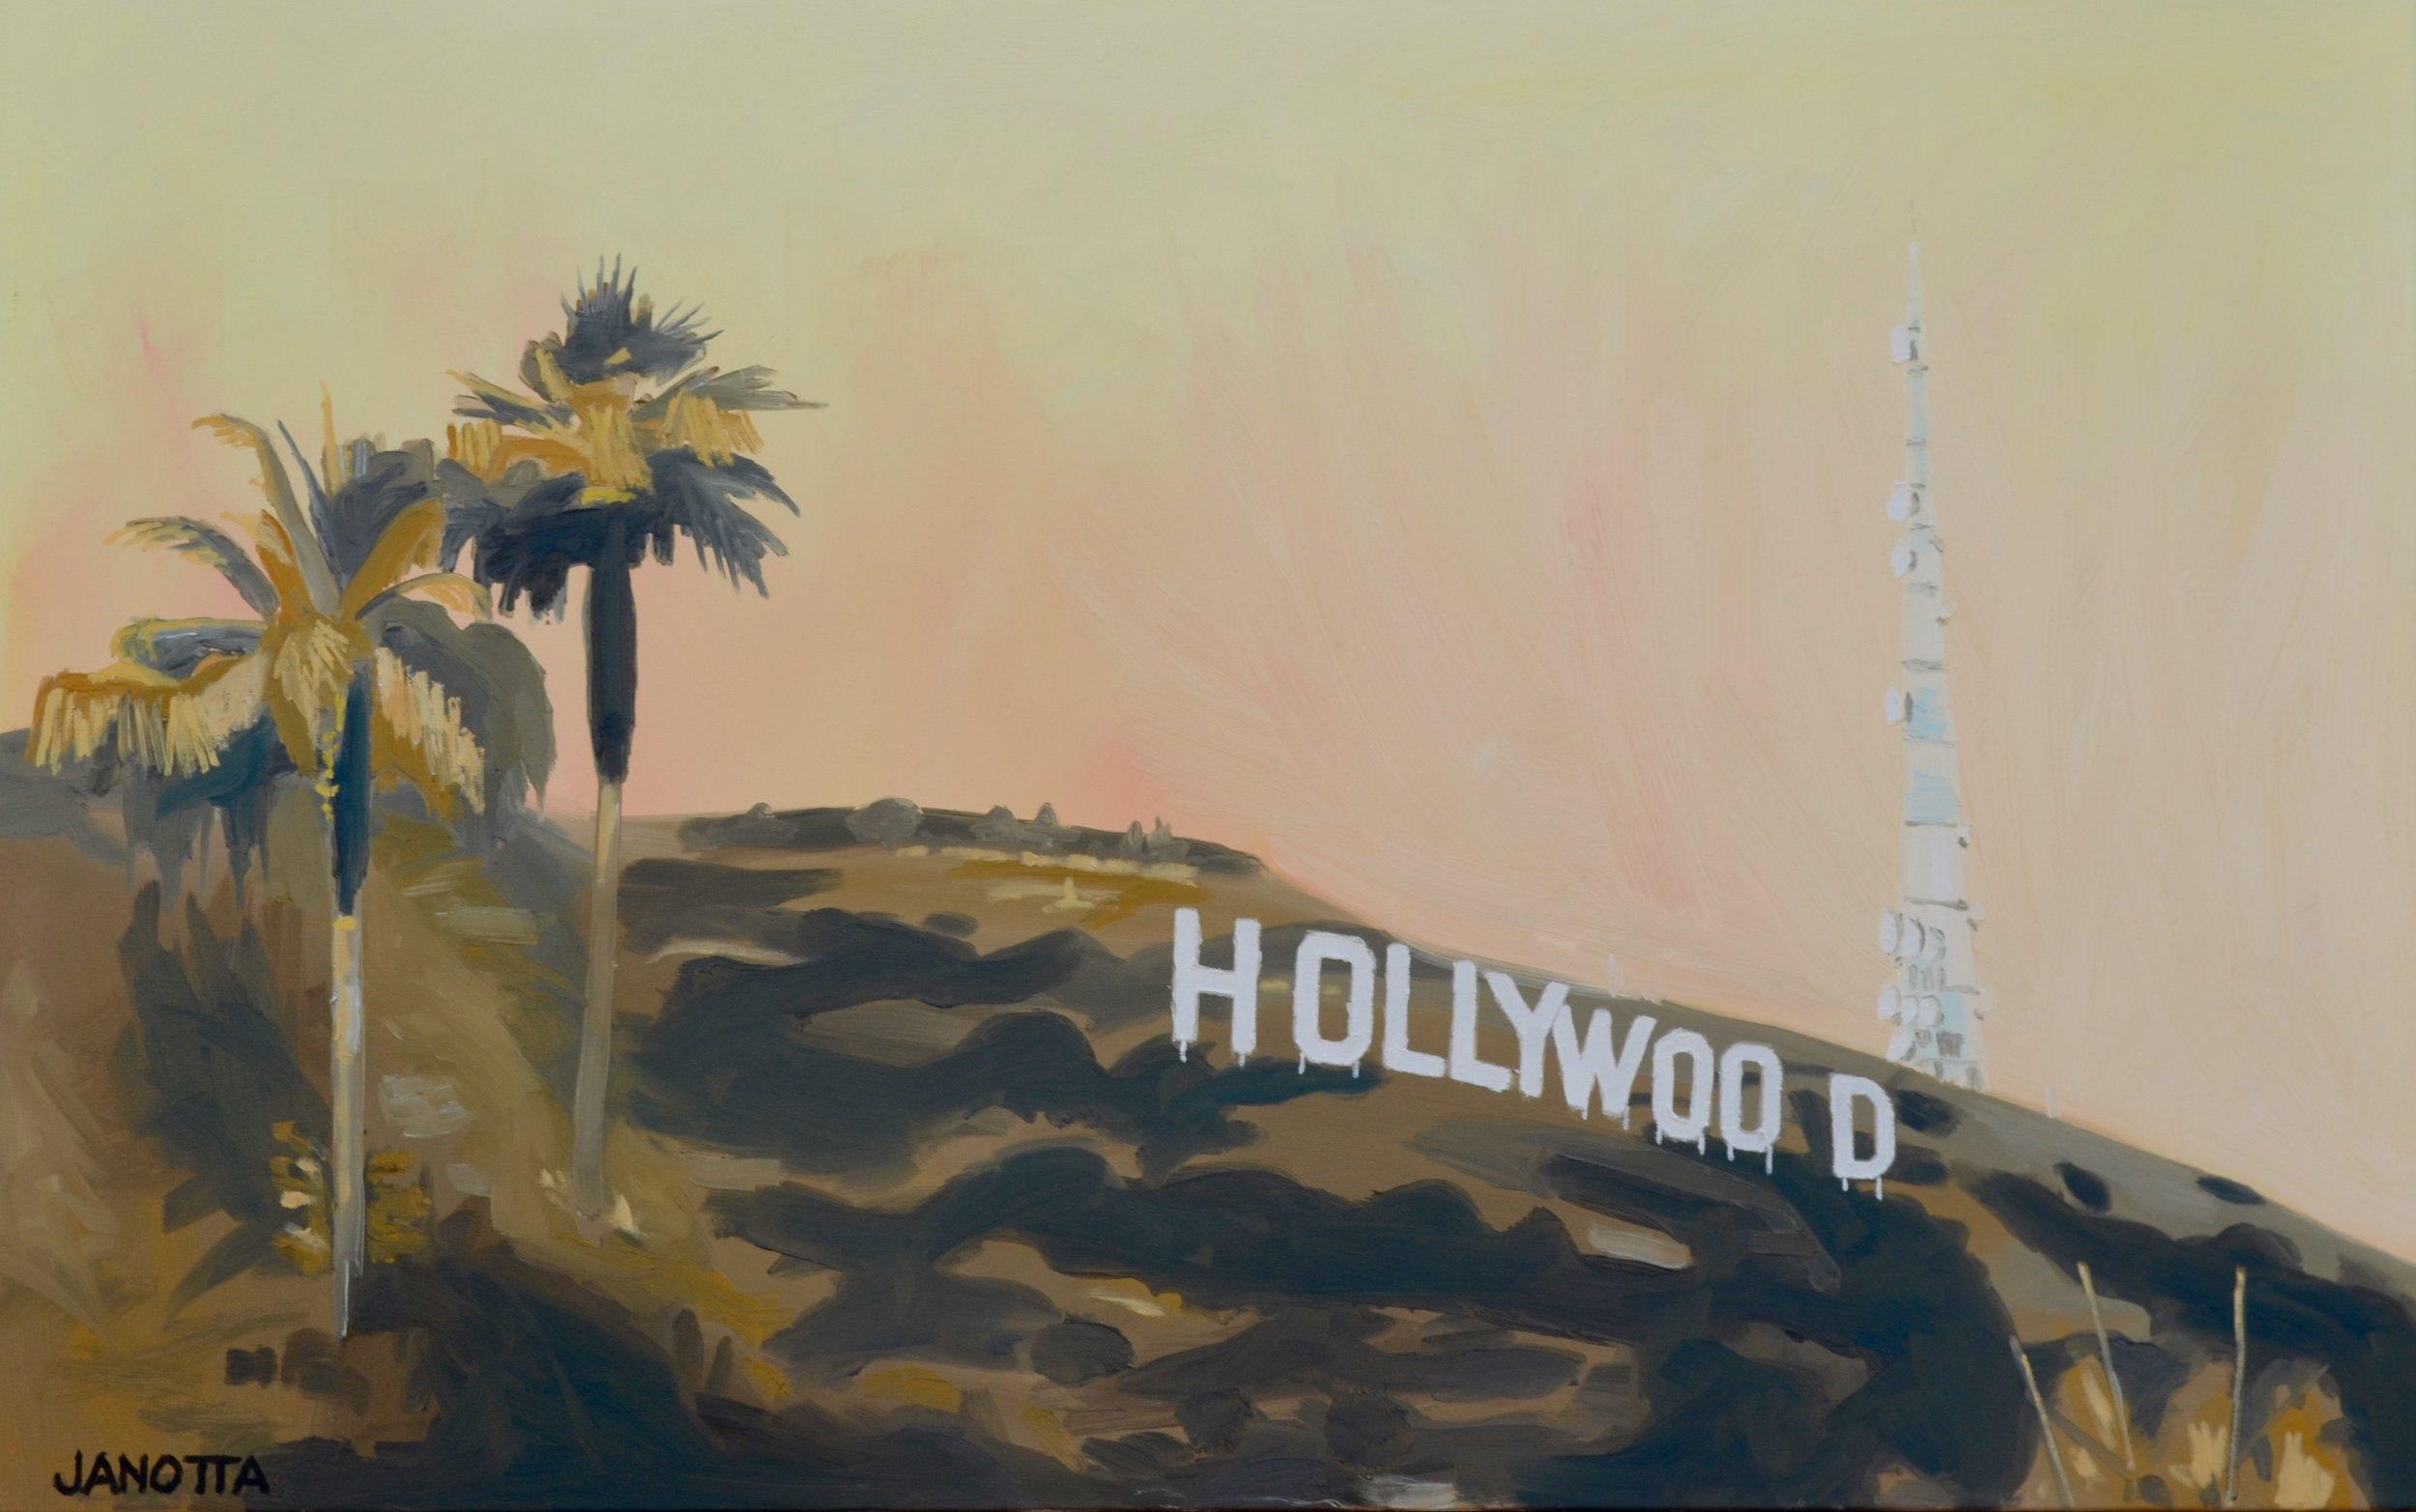 Janotta_Hollywood Sign_48x30.jpg